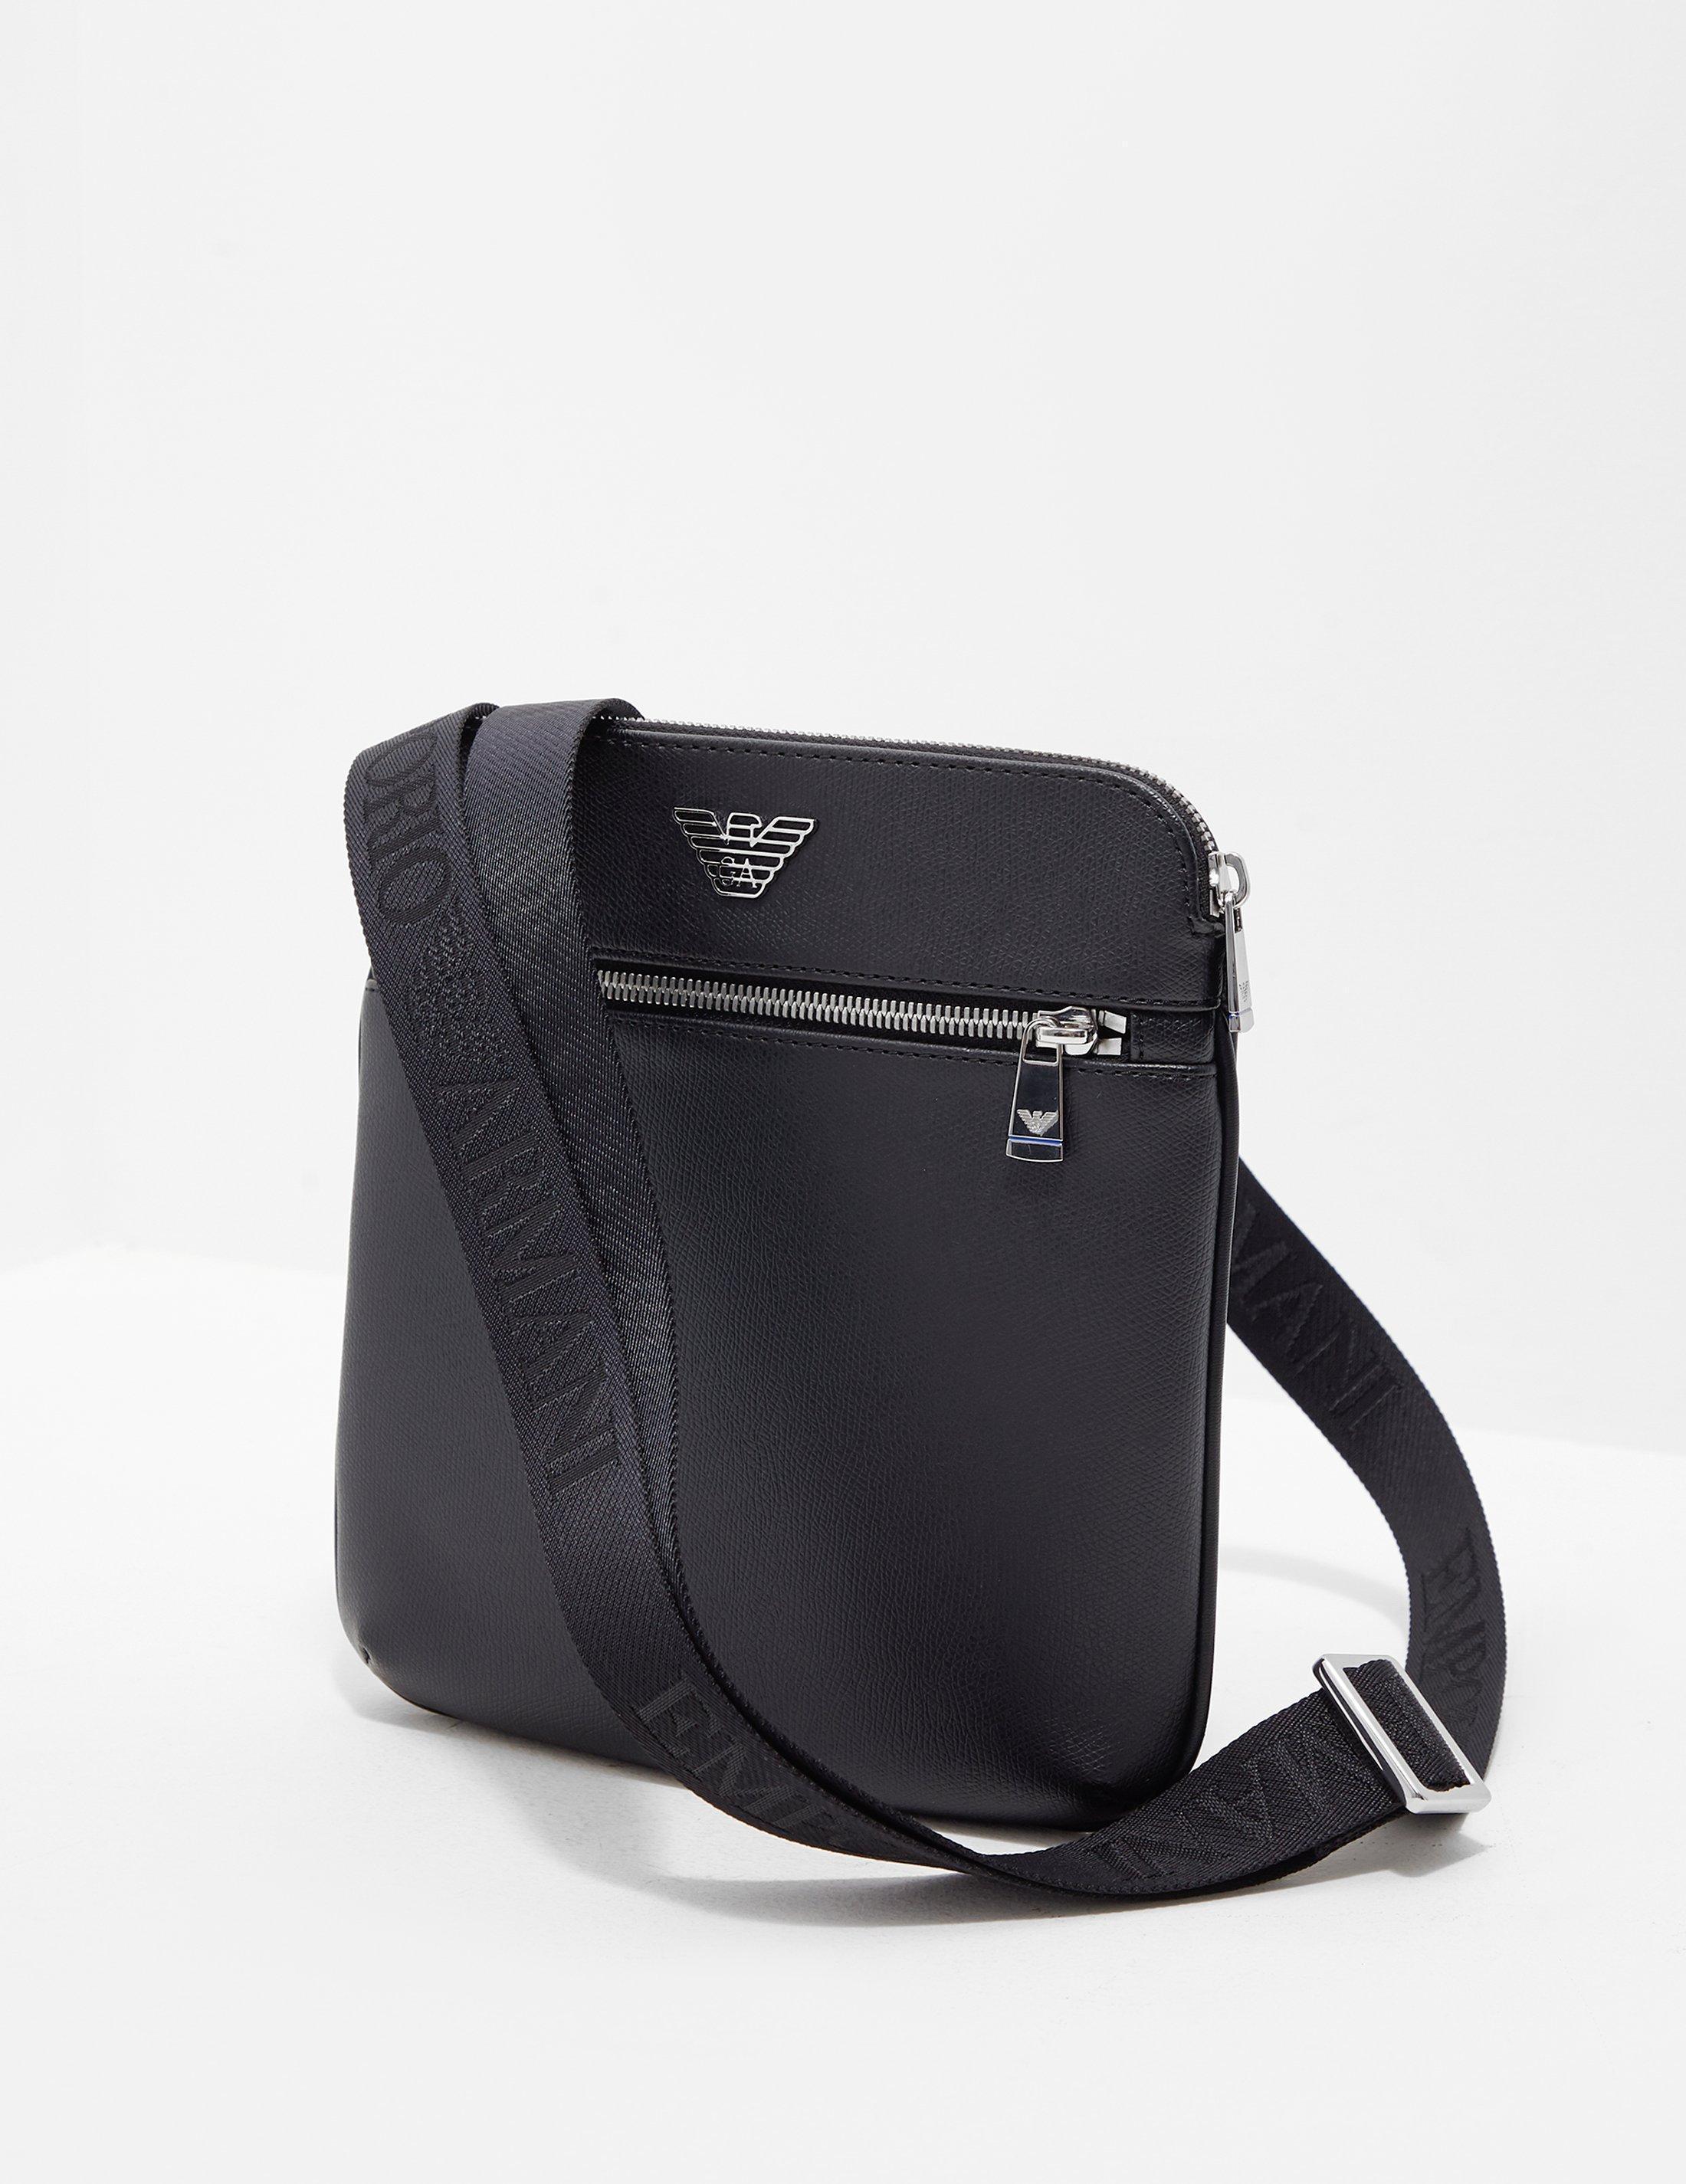 3fda748b93cac9 Emporio Armani Metallic Eagle Small Item Bag Black in Black for Men ...